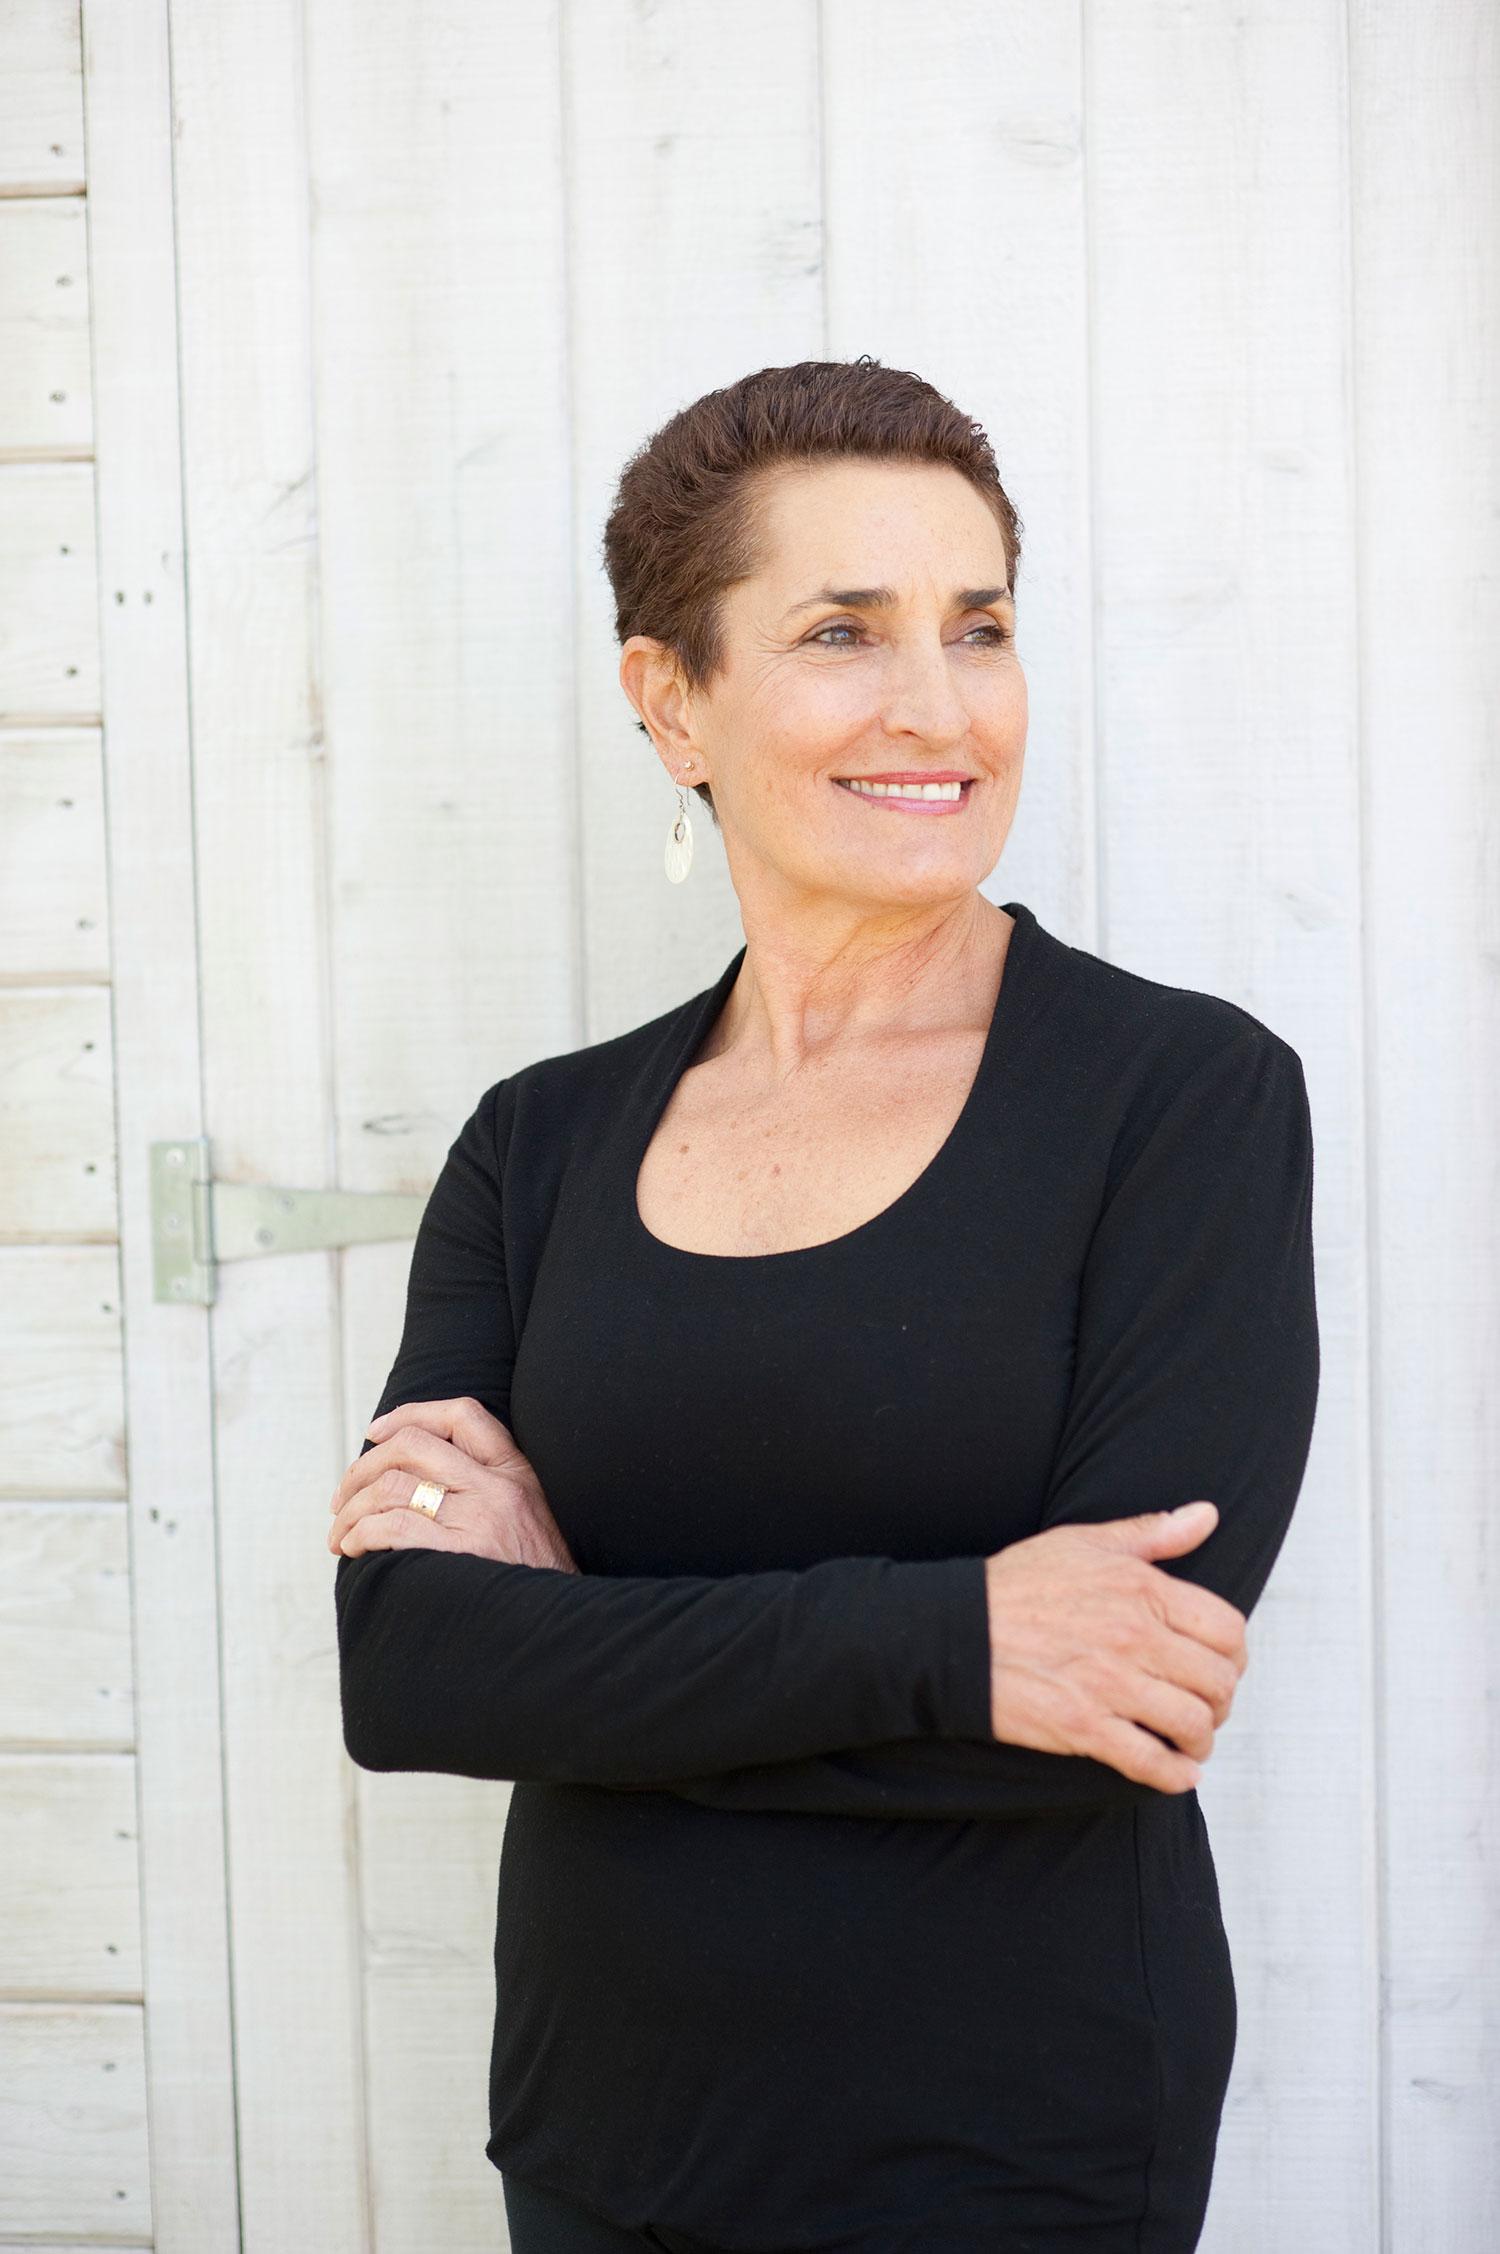 Sheena Nancy Sarles, entrepreneur